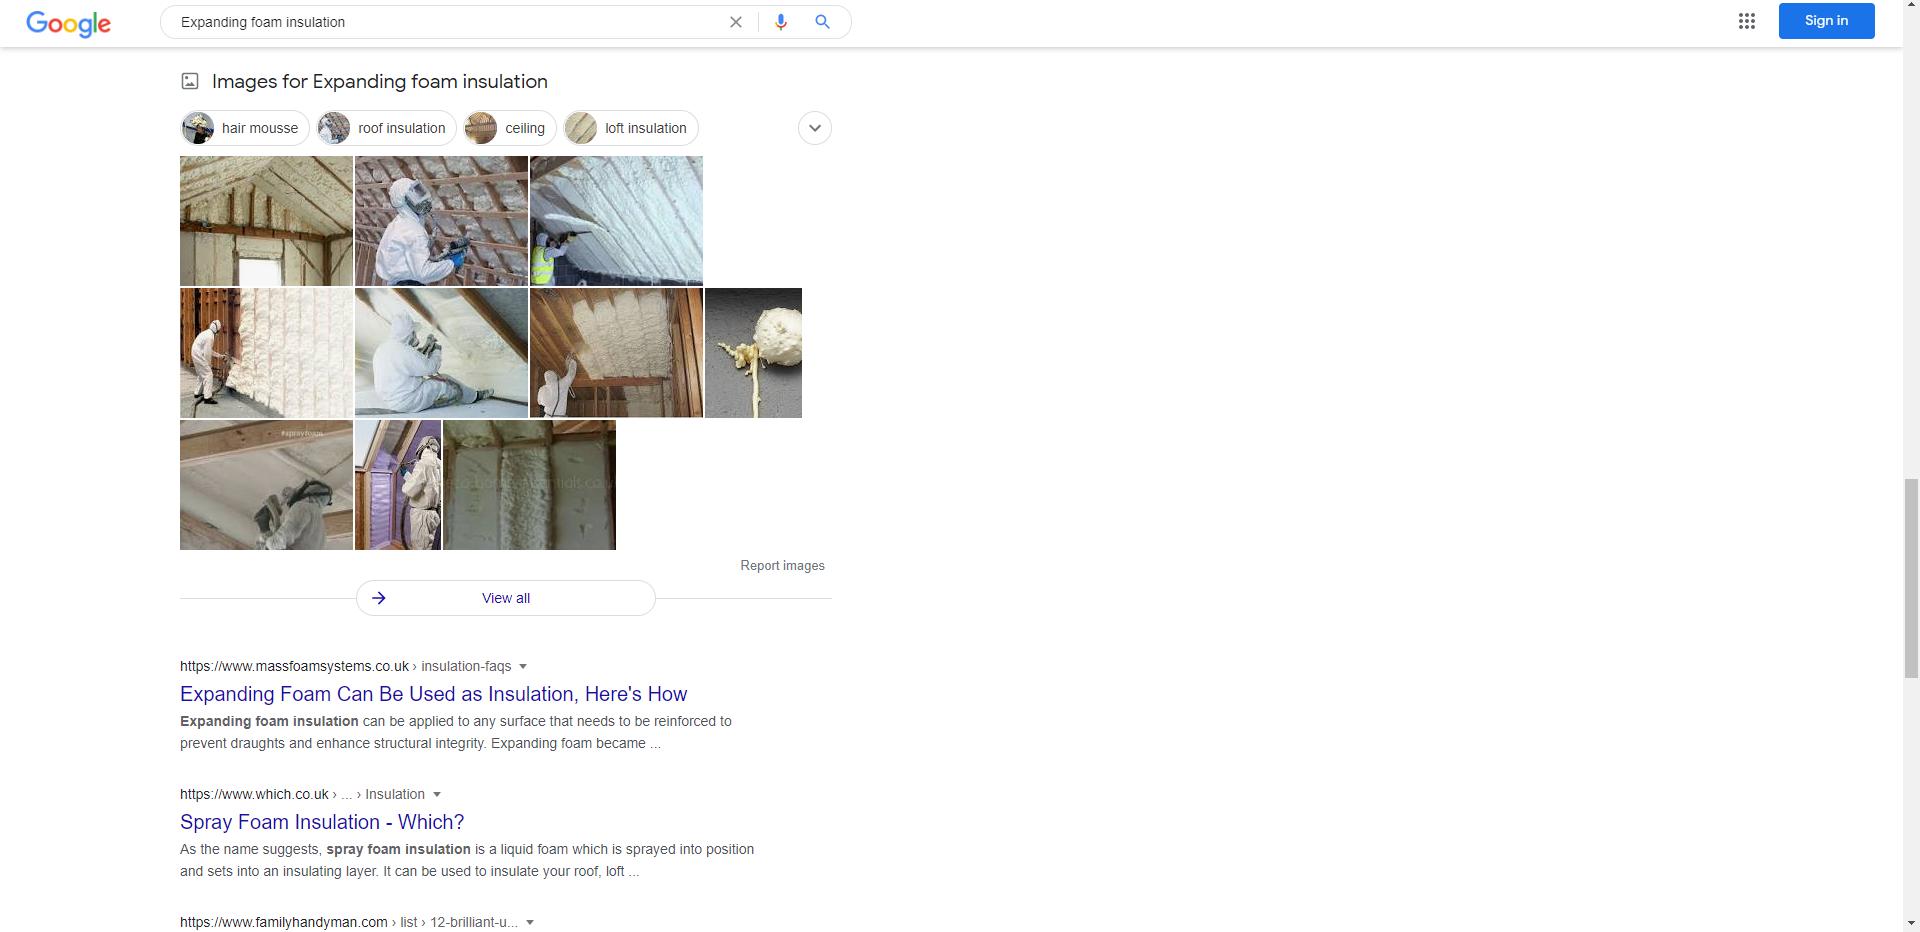 Google Expanding Foam Insulation Result